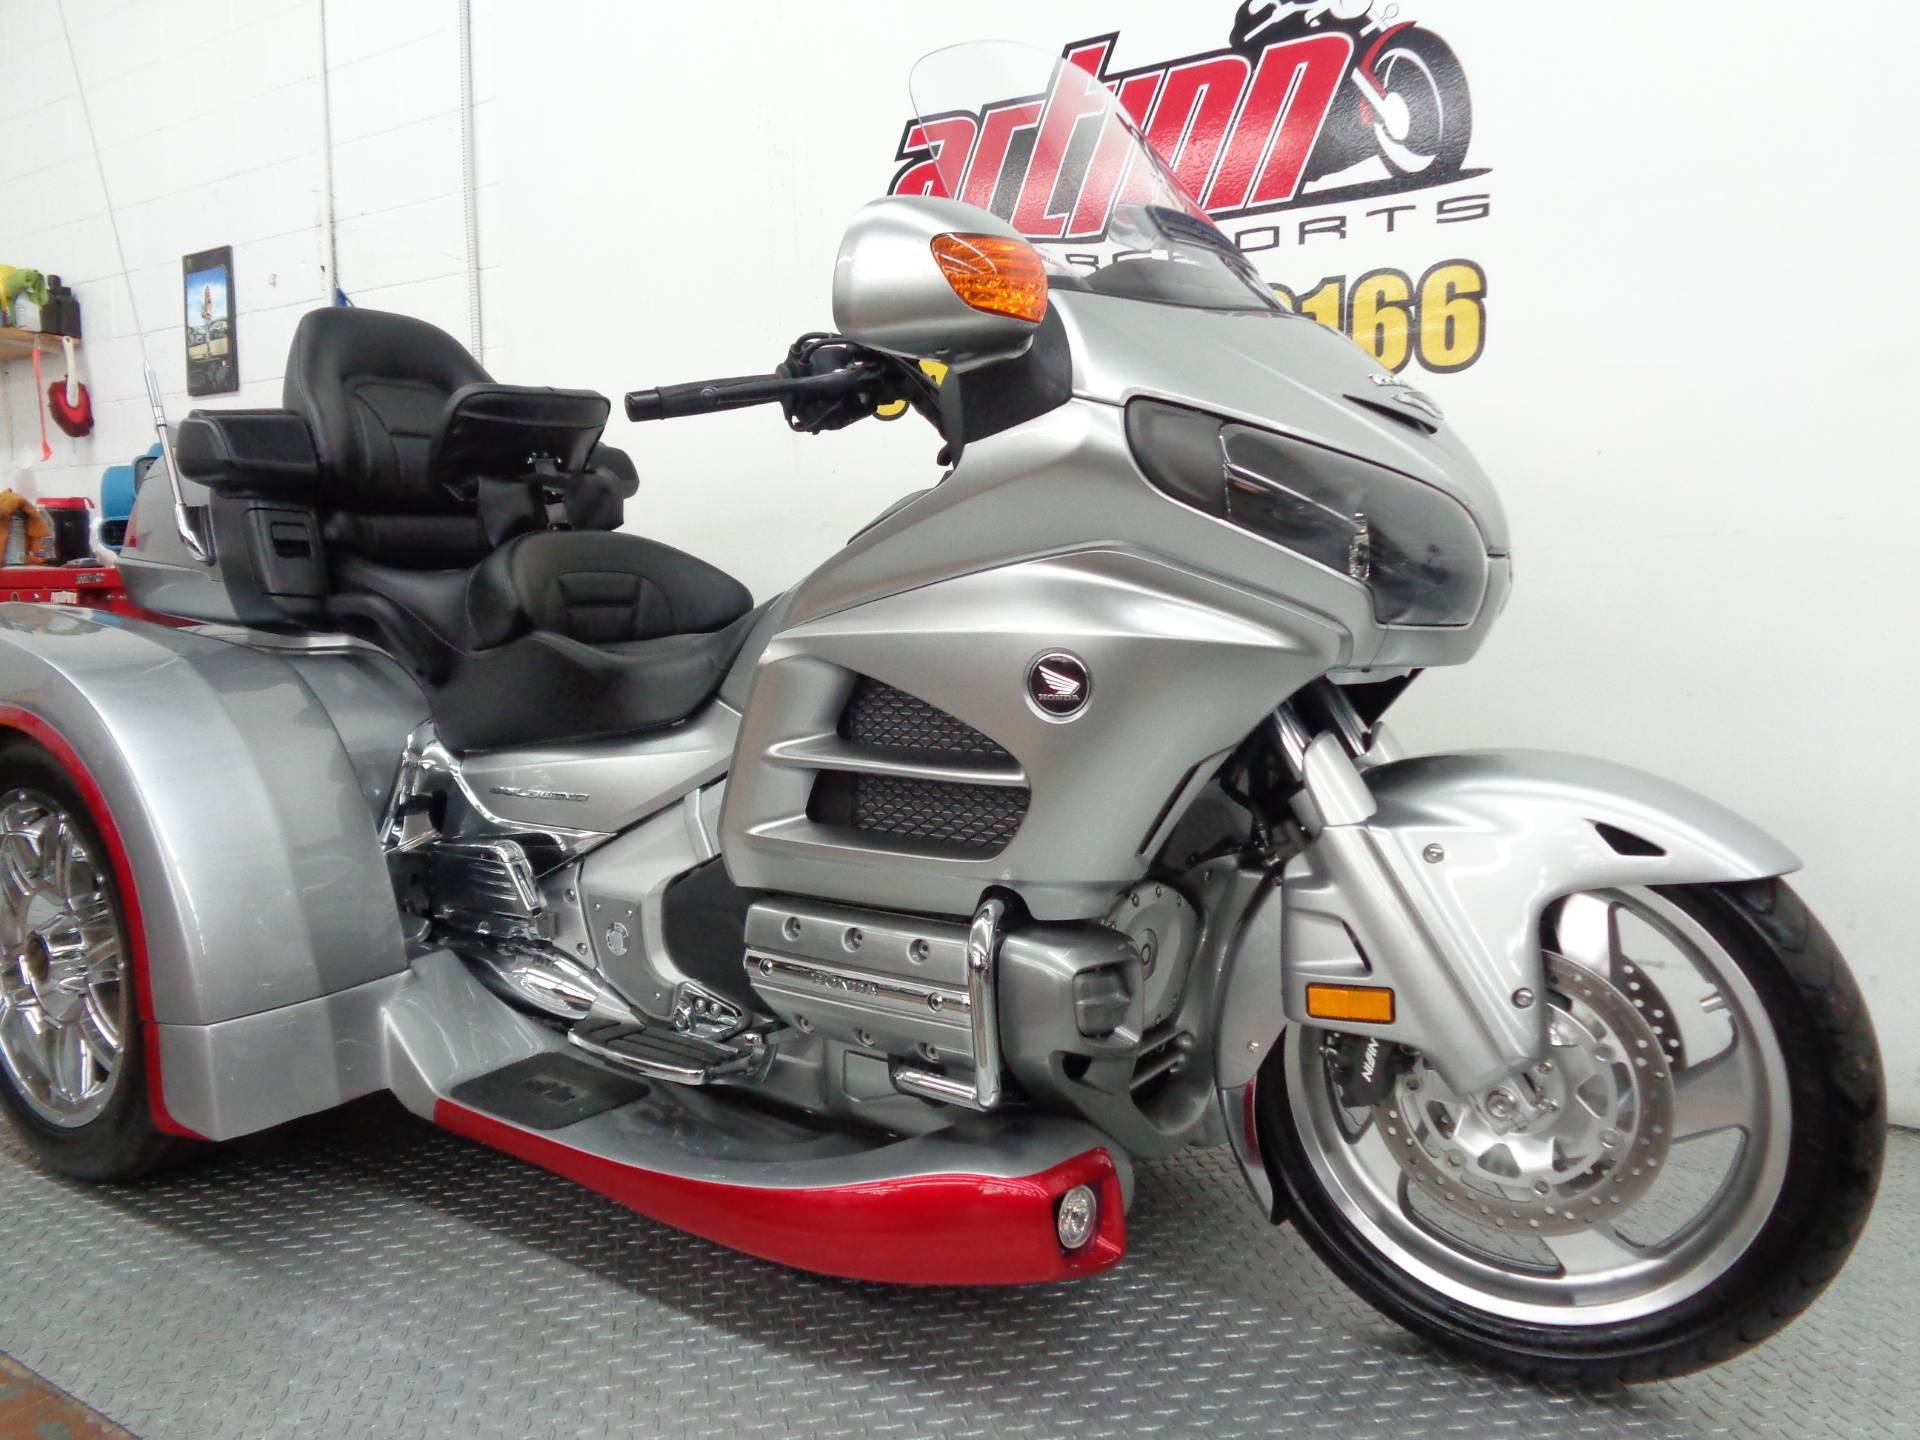 Honda Utvs For Sale Tulsa Ok >> 2015 Honda GoldWing Trike For Sale Tulsa, OK : 62798